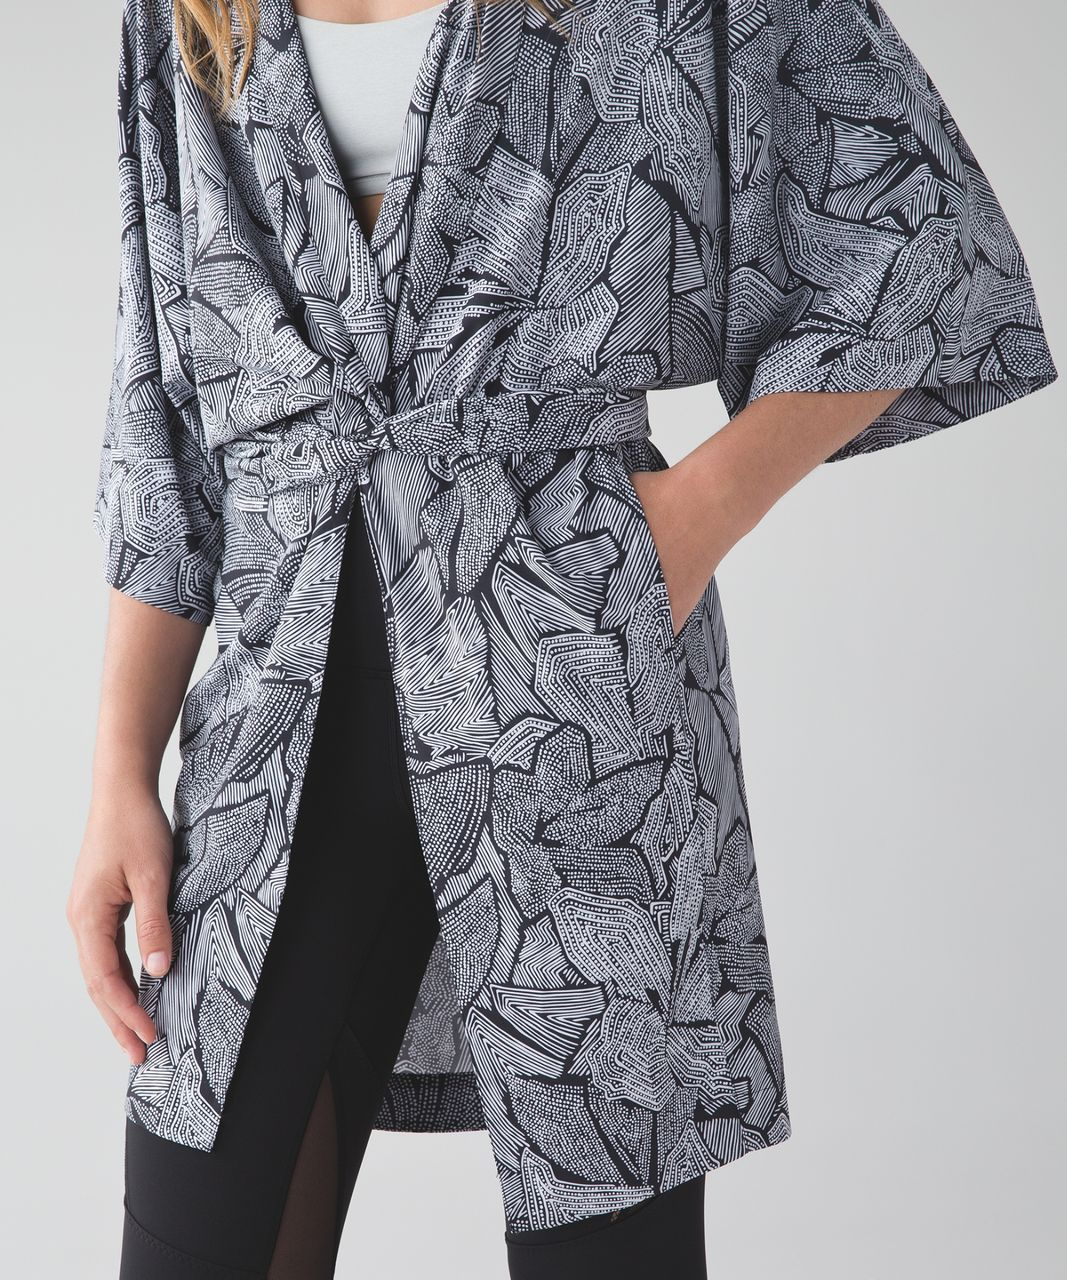 Lululemon Yoga Haven Kimono - Dottie Tribe White Black